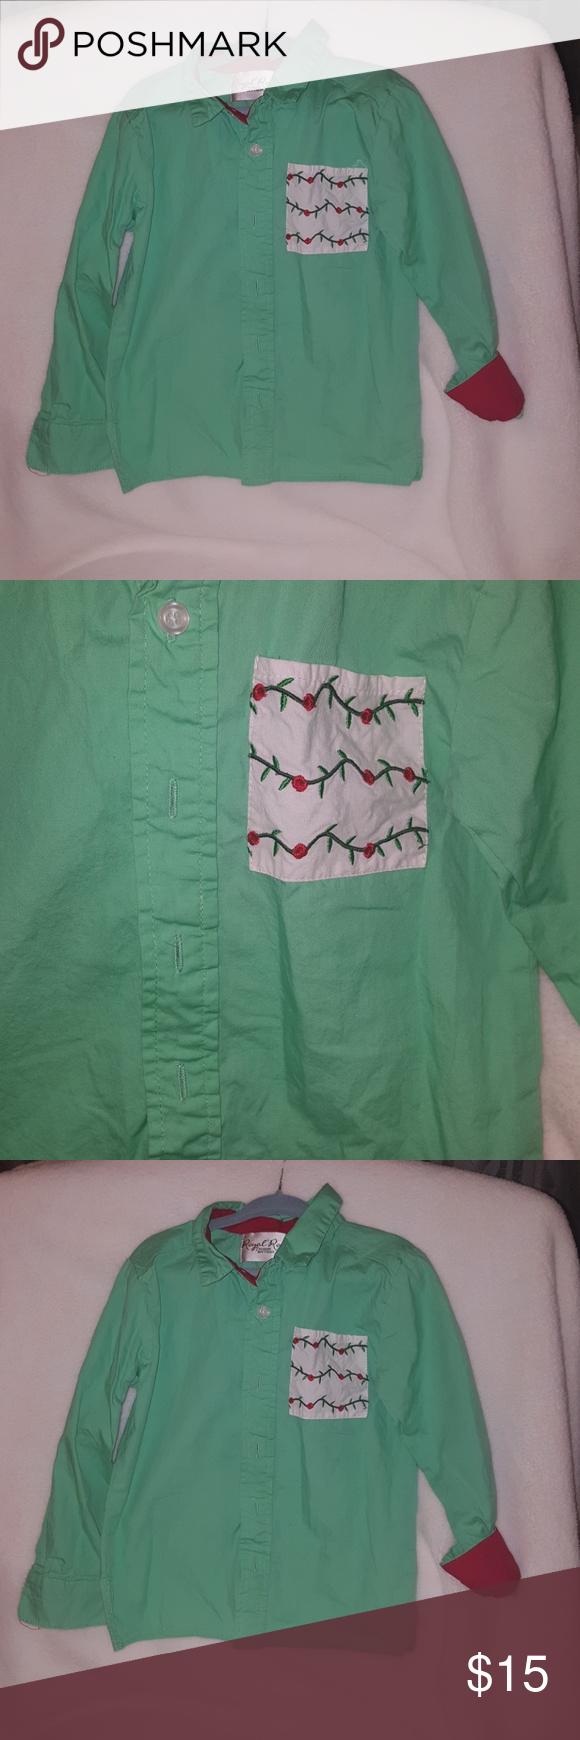 Boys light green Christmas dress shirt  Red accents Dress shirts